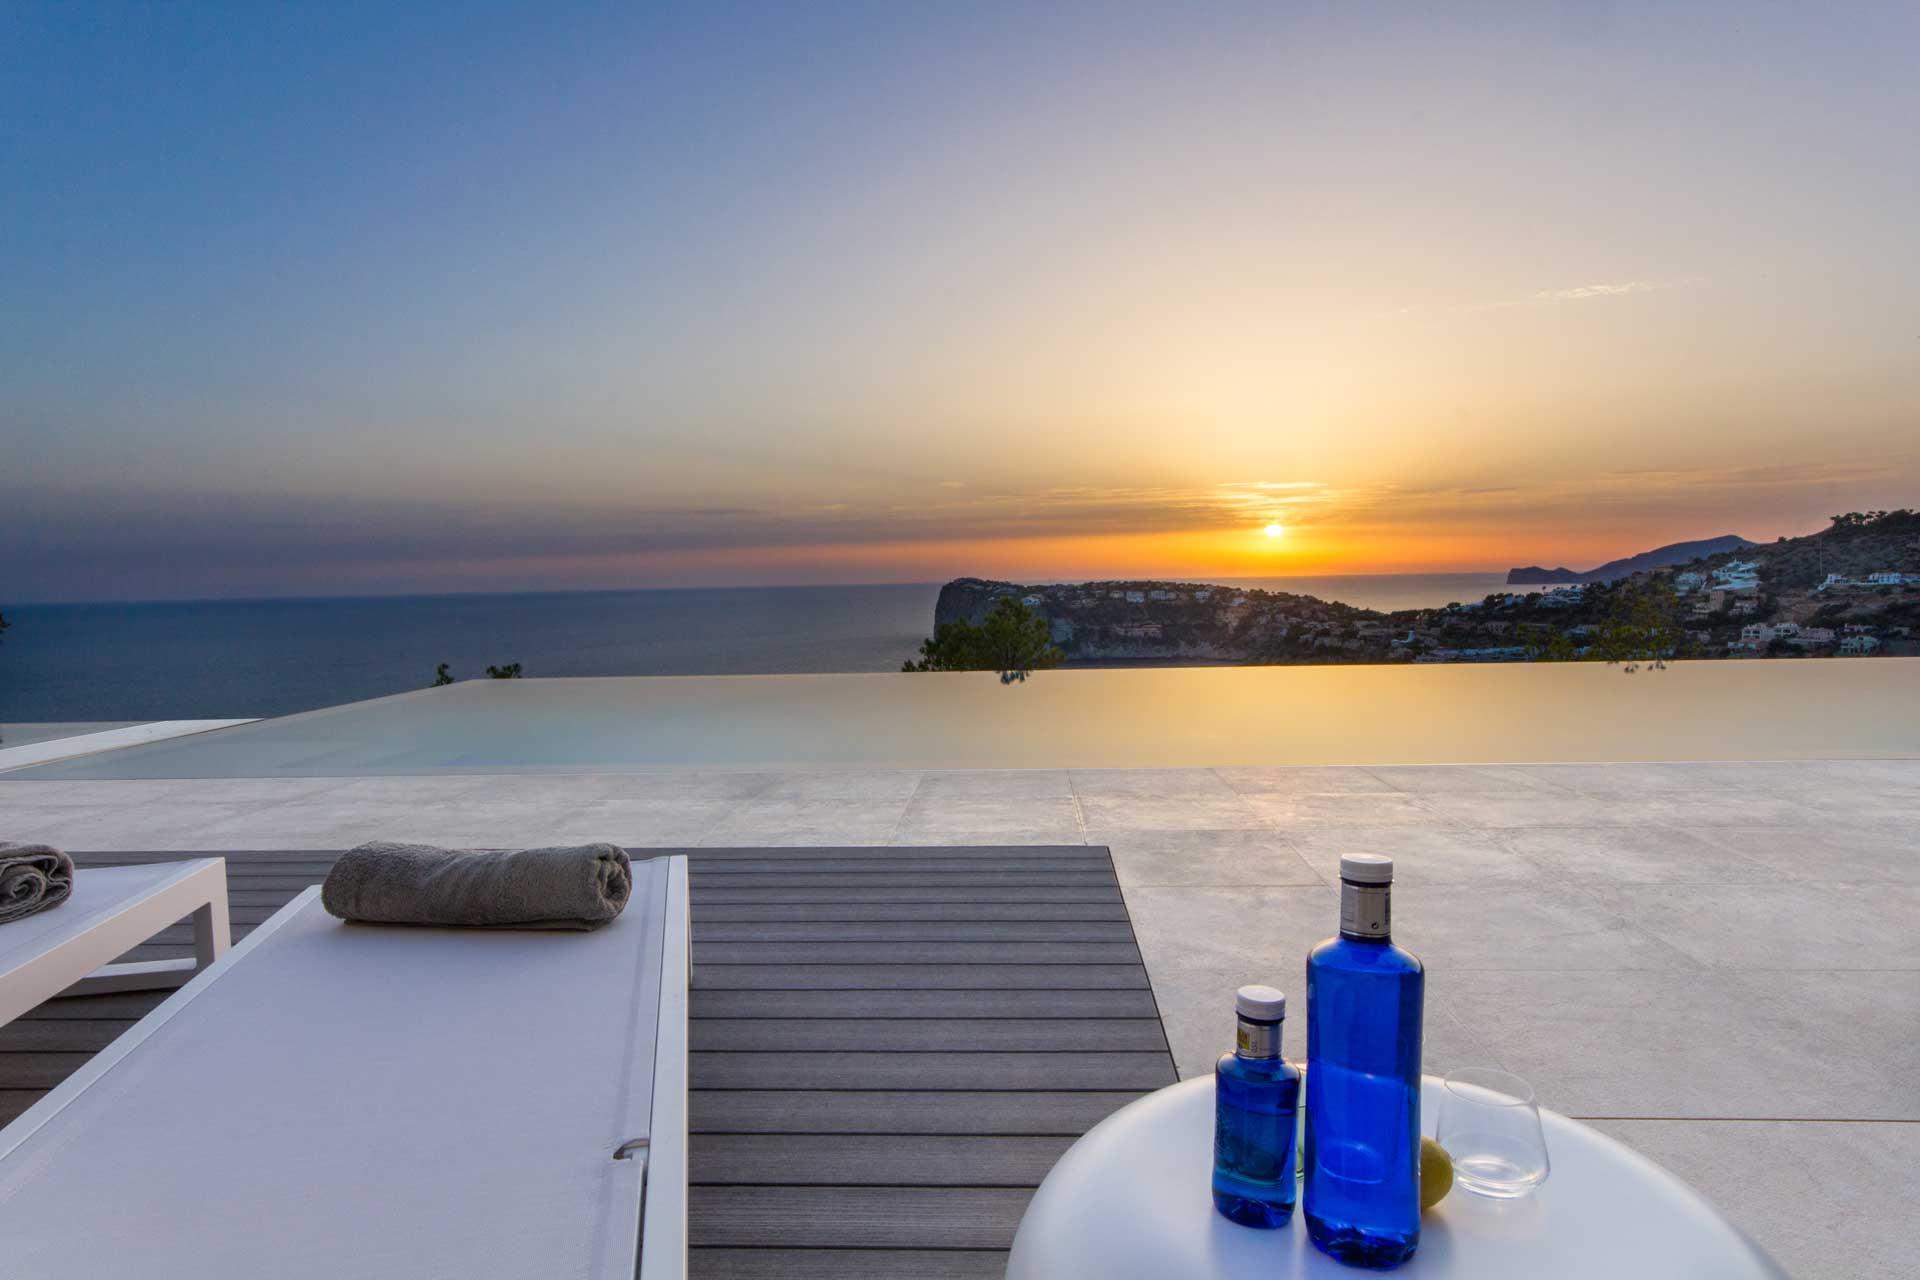 Villa Puesta del Sol - Sunset